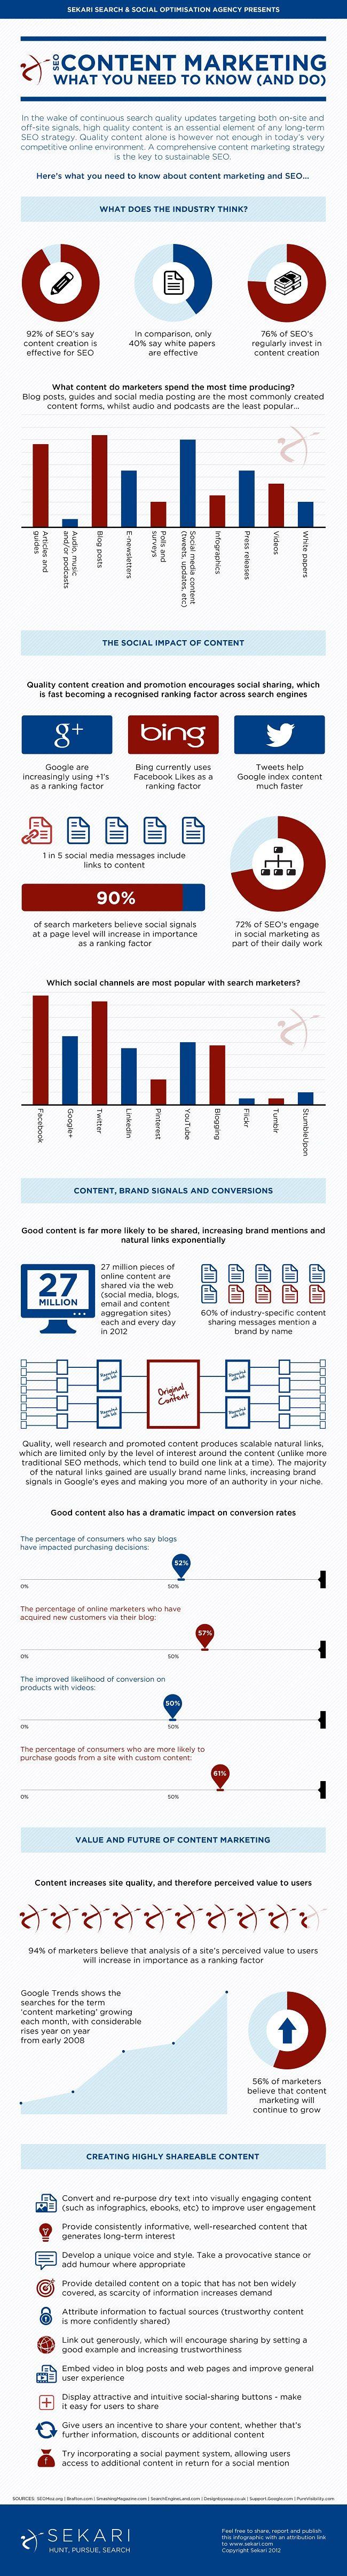 content marketing #SEO strategy Infographic www.socialmediamamma.com